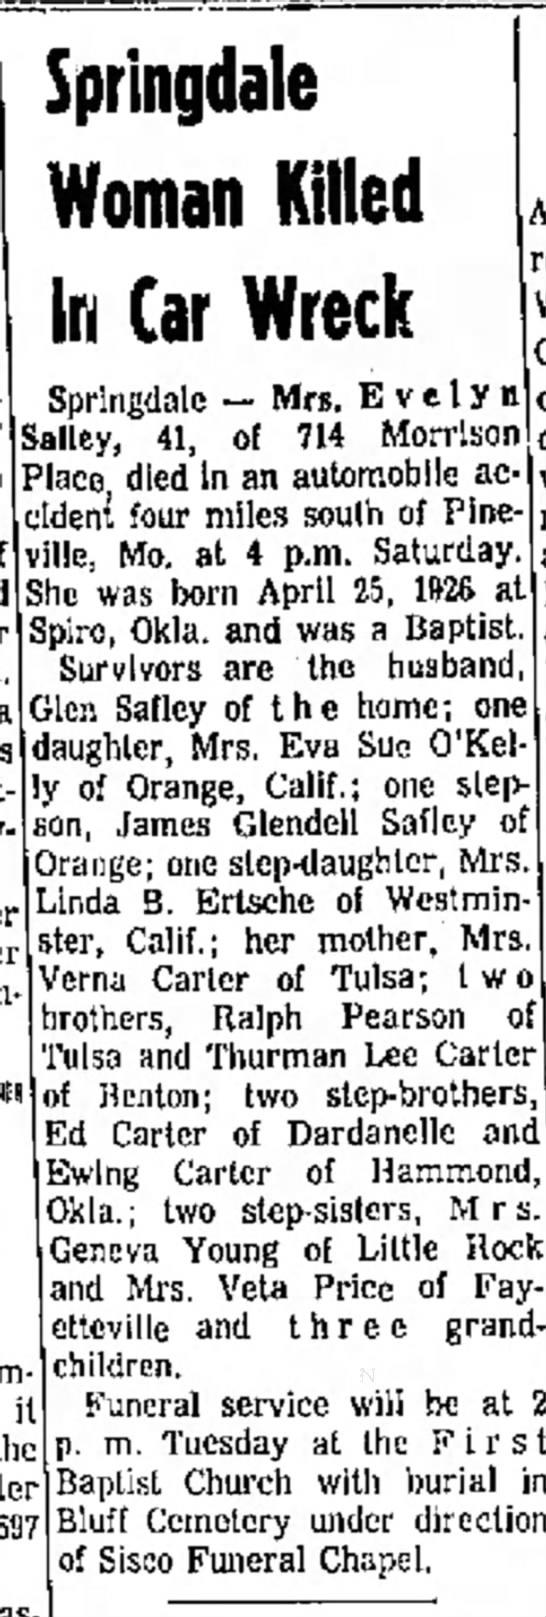 Safley, Evelyn Northwest AR Times, Fayettville 12-4-1967 -